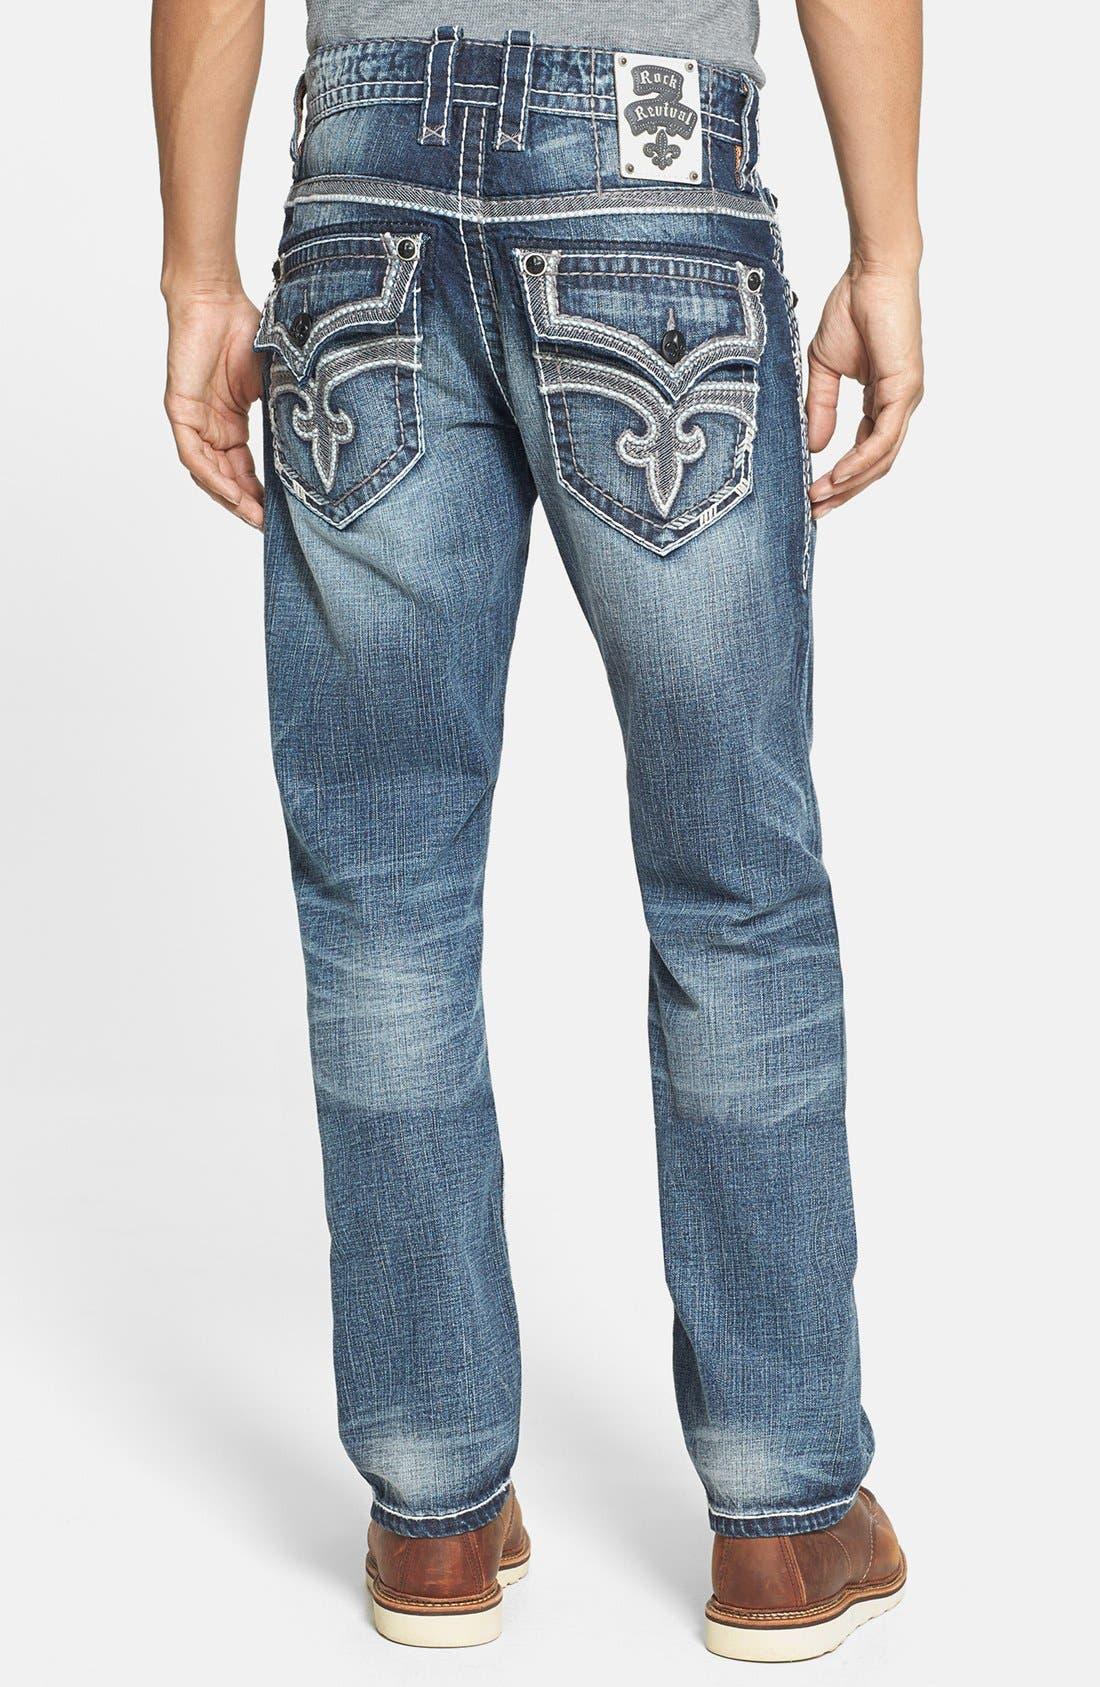 Alternate Image 1 Selected - Rock Revival 'Humfrey' Straight Leg Jeans (Medium Blue)